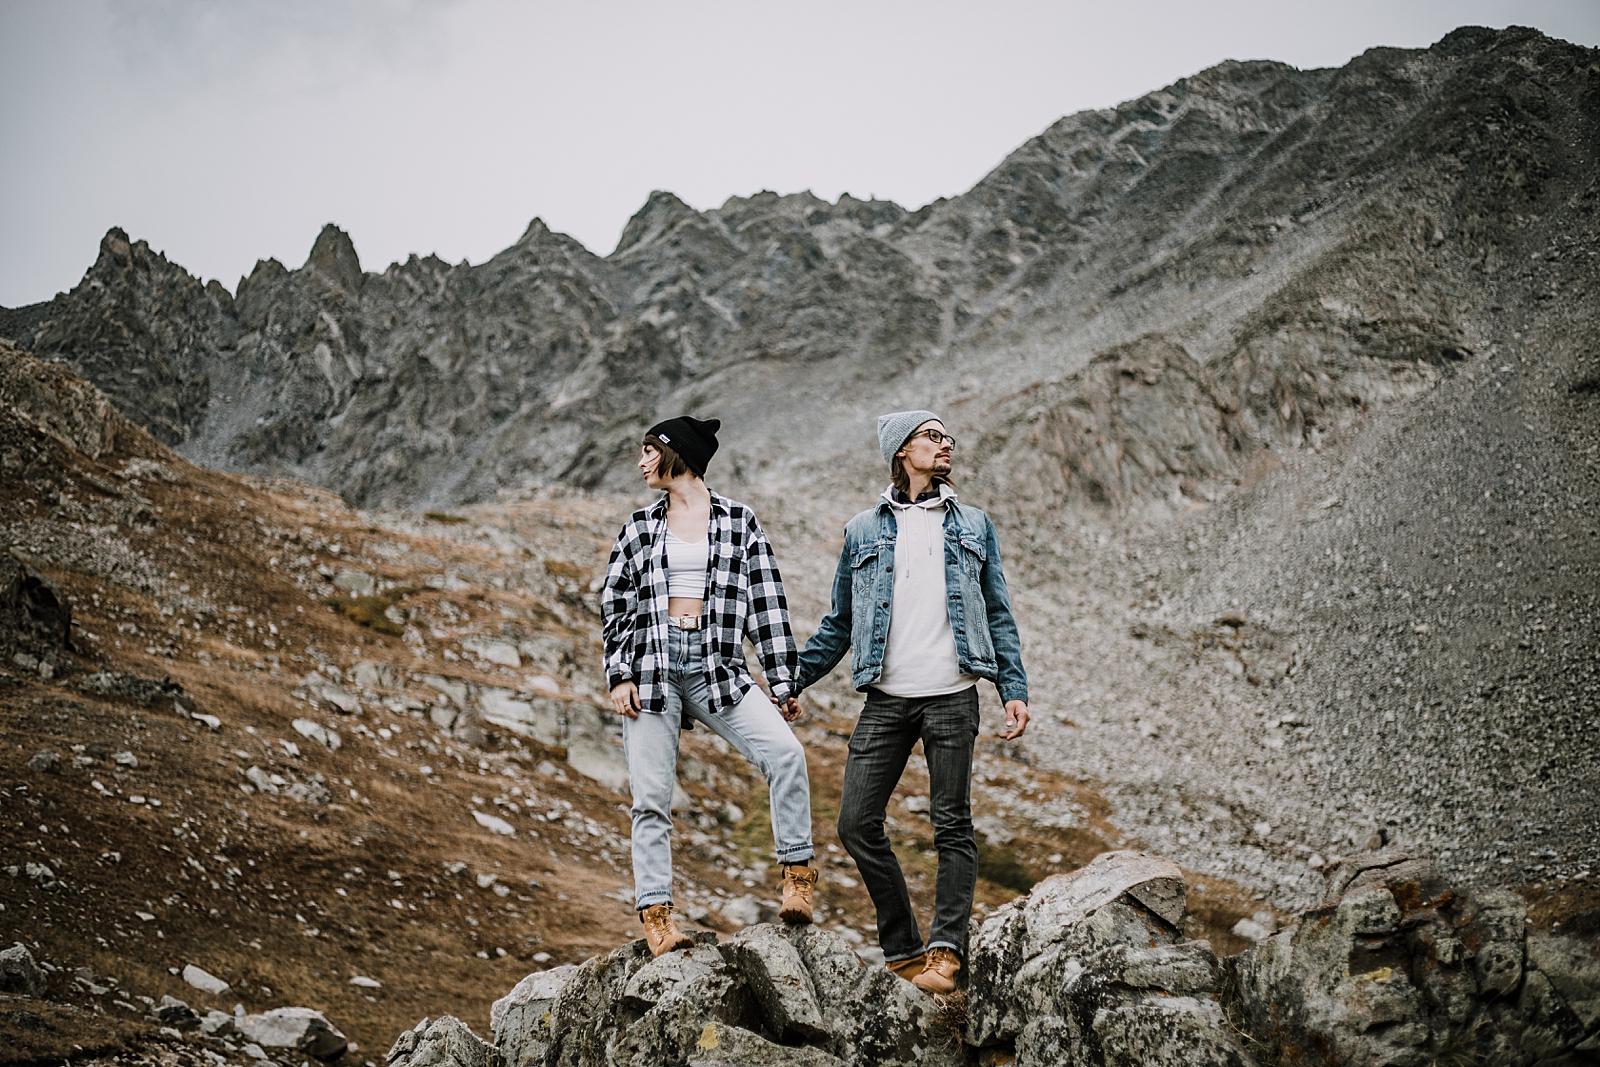 couple on mountain, colorado surprise proposal, hike mayflower gulch, mayflower gulch proposal, mayflower gulch elopement, mayflower gulch wedding, colorado mountainscape, leadville elopement